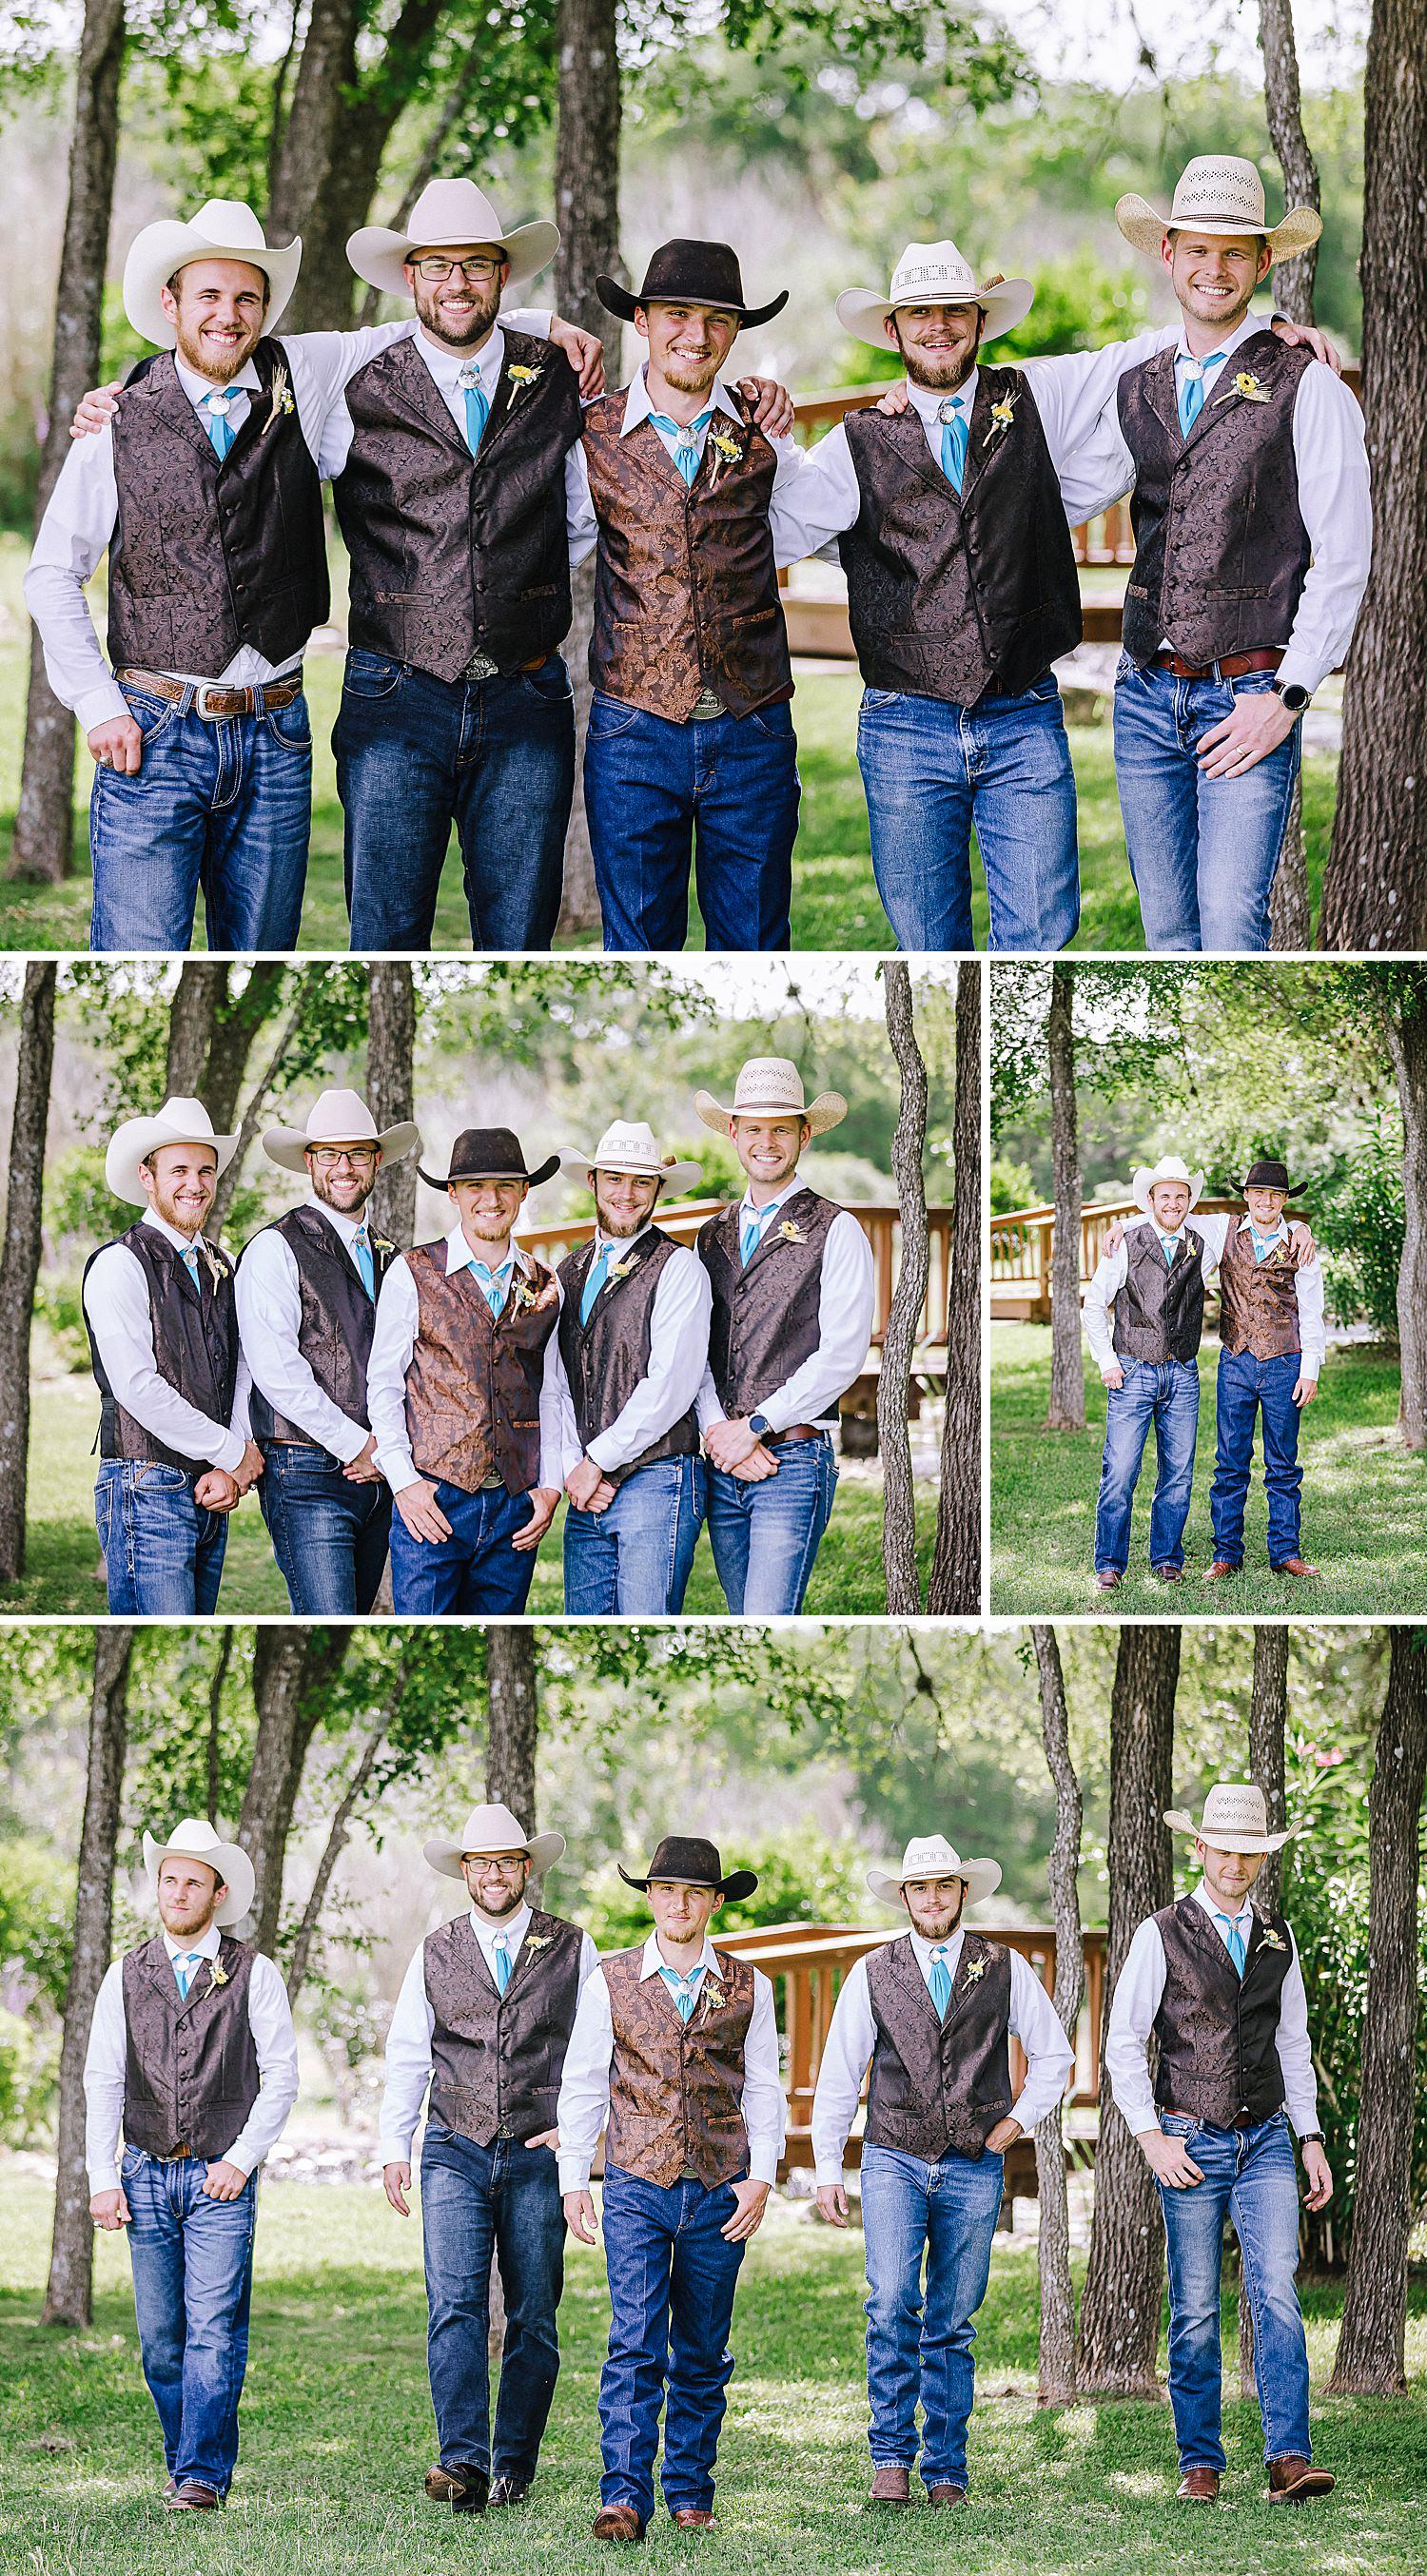 Carly-Barton-Photography-Old-Town-Texas-Rustic-Wedding-Photos-Sunflowers-Boots-Kyle-Texas_0057.jpg